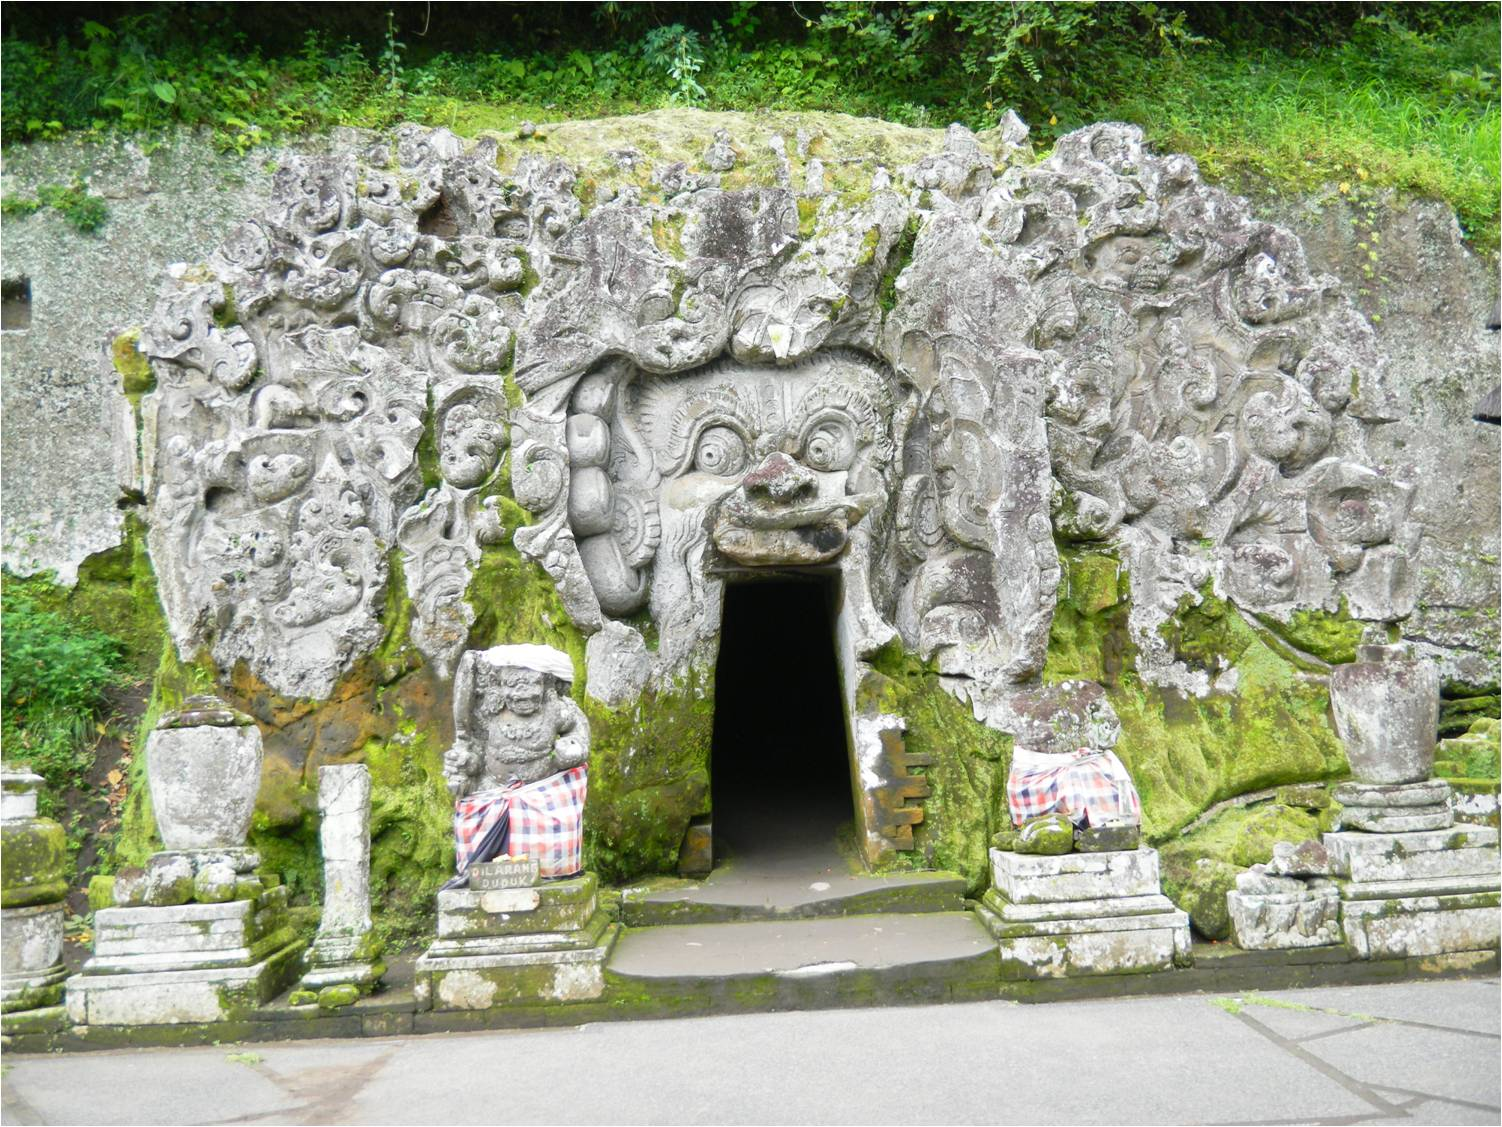 Wisata Gua Destinasi Pariwisata Indonesia Tiket Masuk Goa Gajah Bali